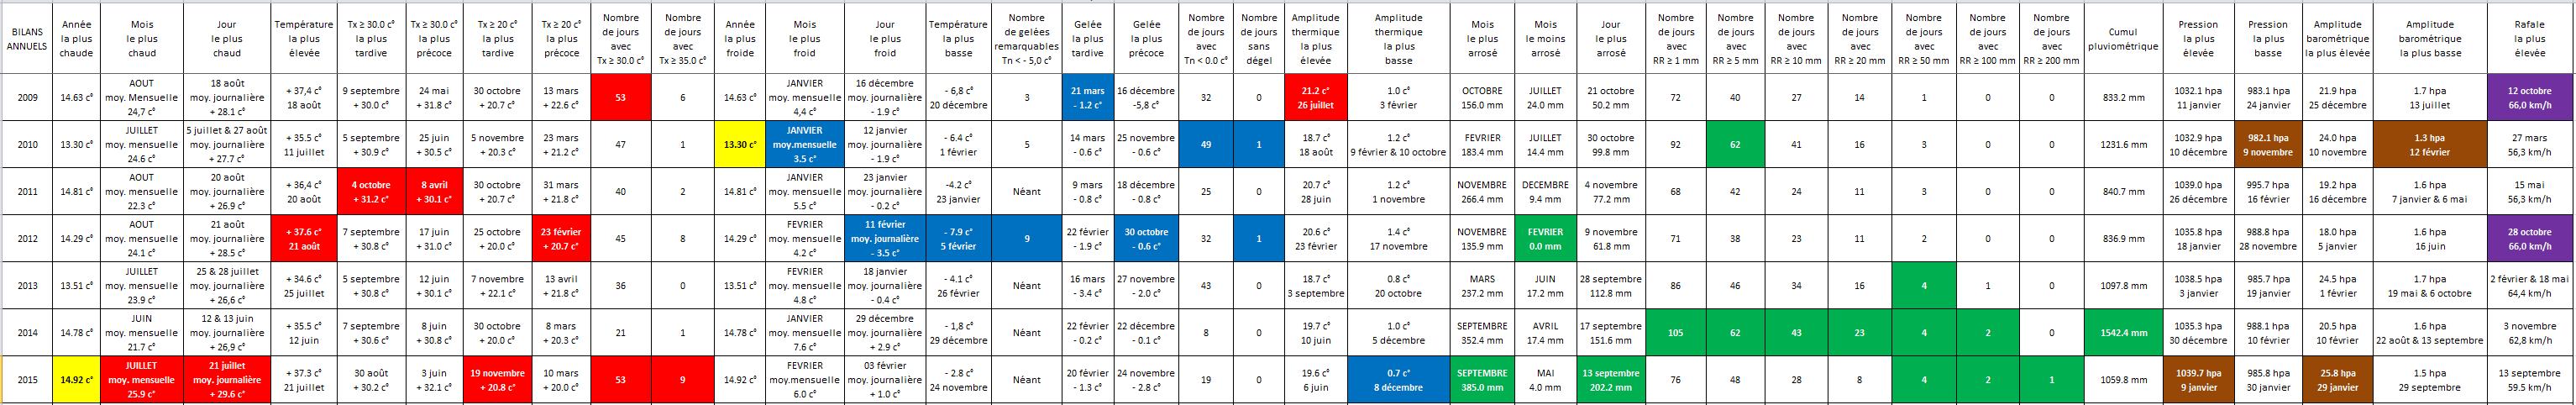 Bilan climatique 2015